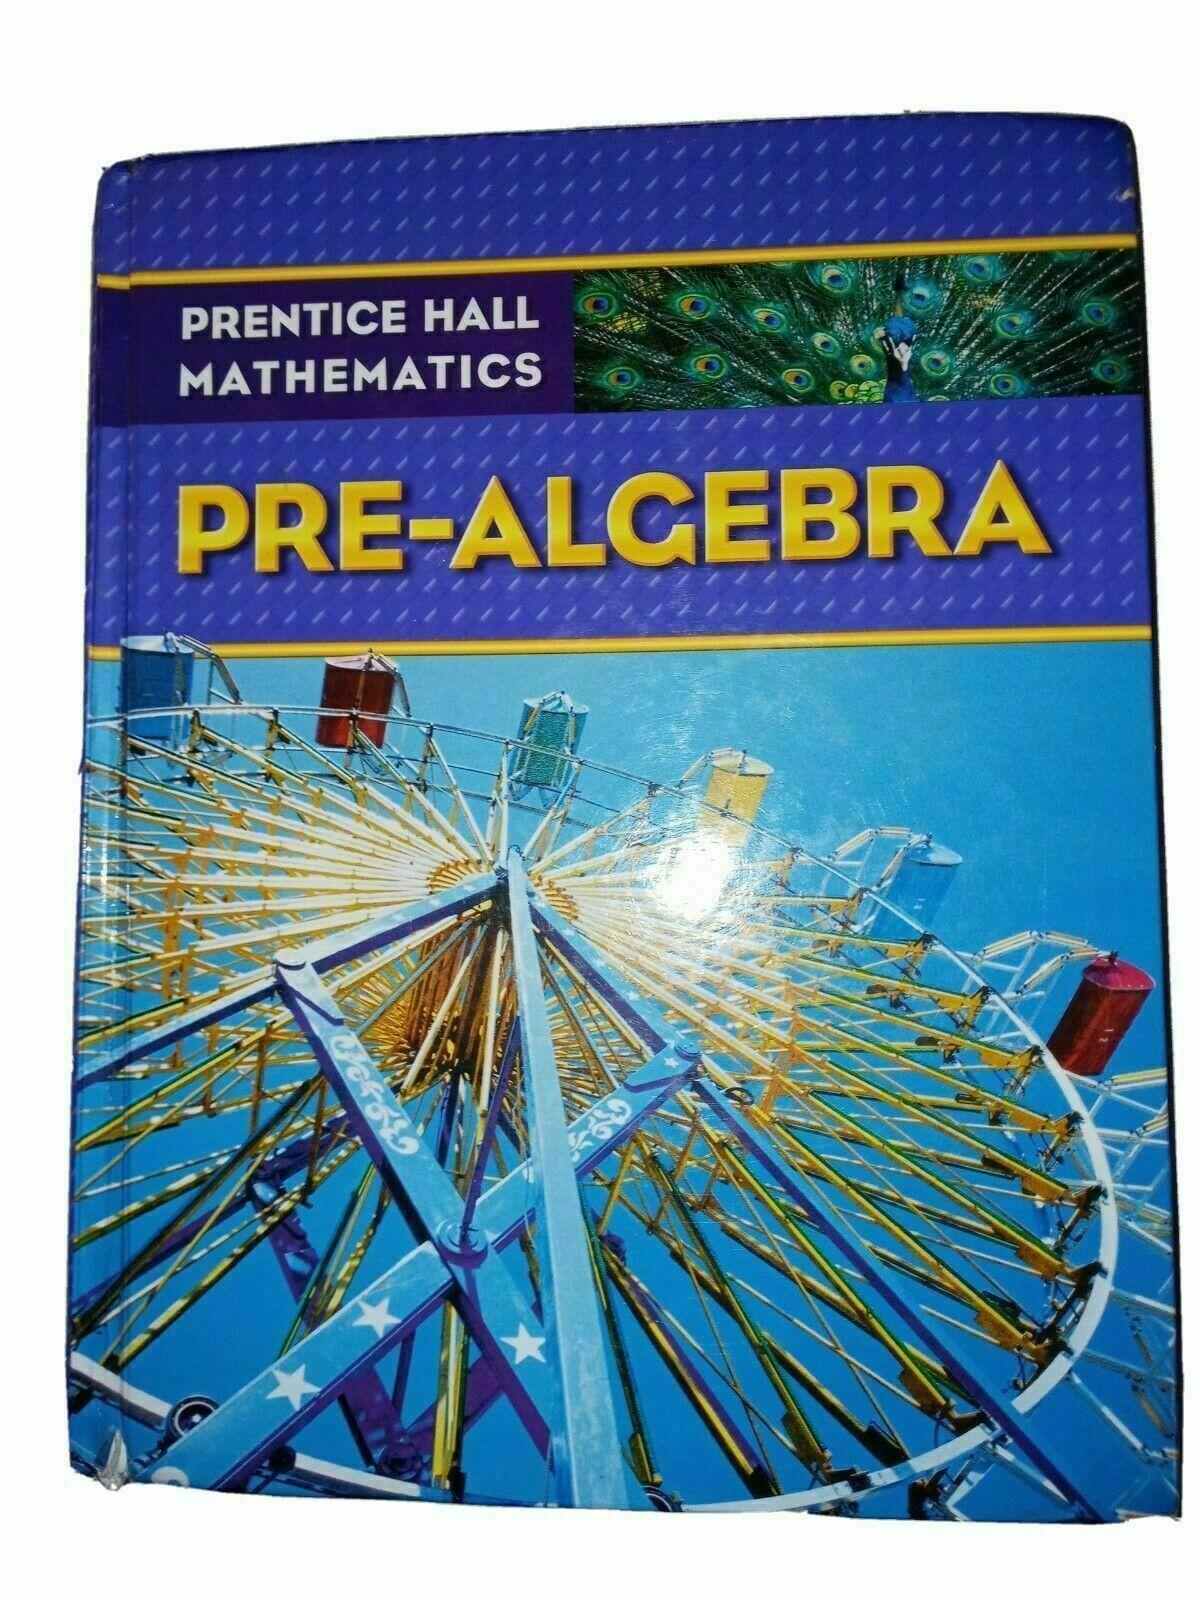 Prentice Hall Mathematics Pre Algebra Hardcover Student Edition Textbook In 2020 Pre Algebra Algebra Mathematics